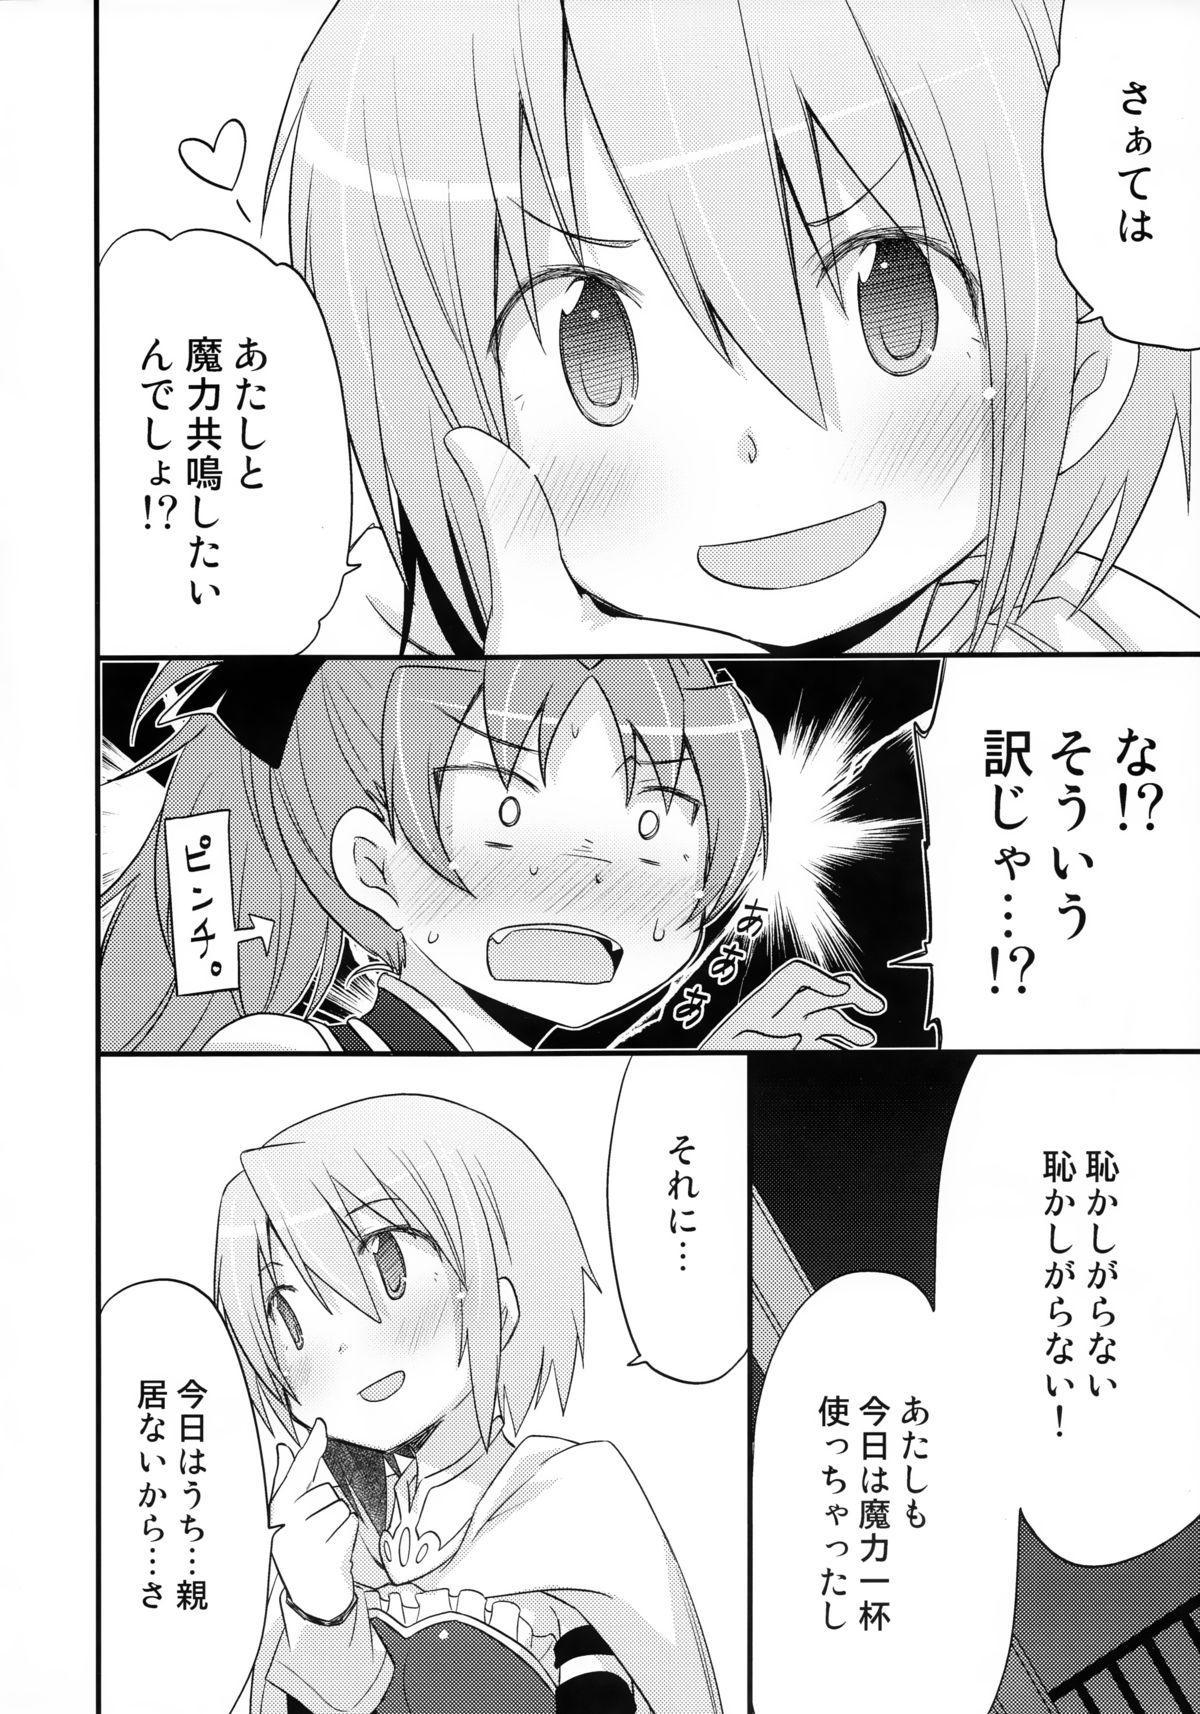 Futari no Hatsukousen 6